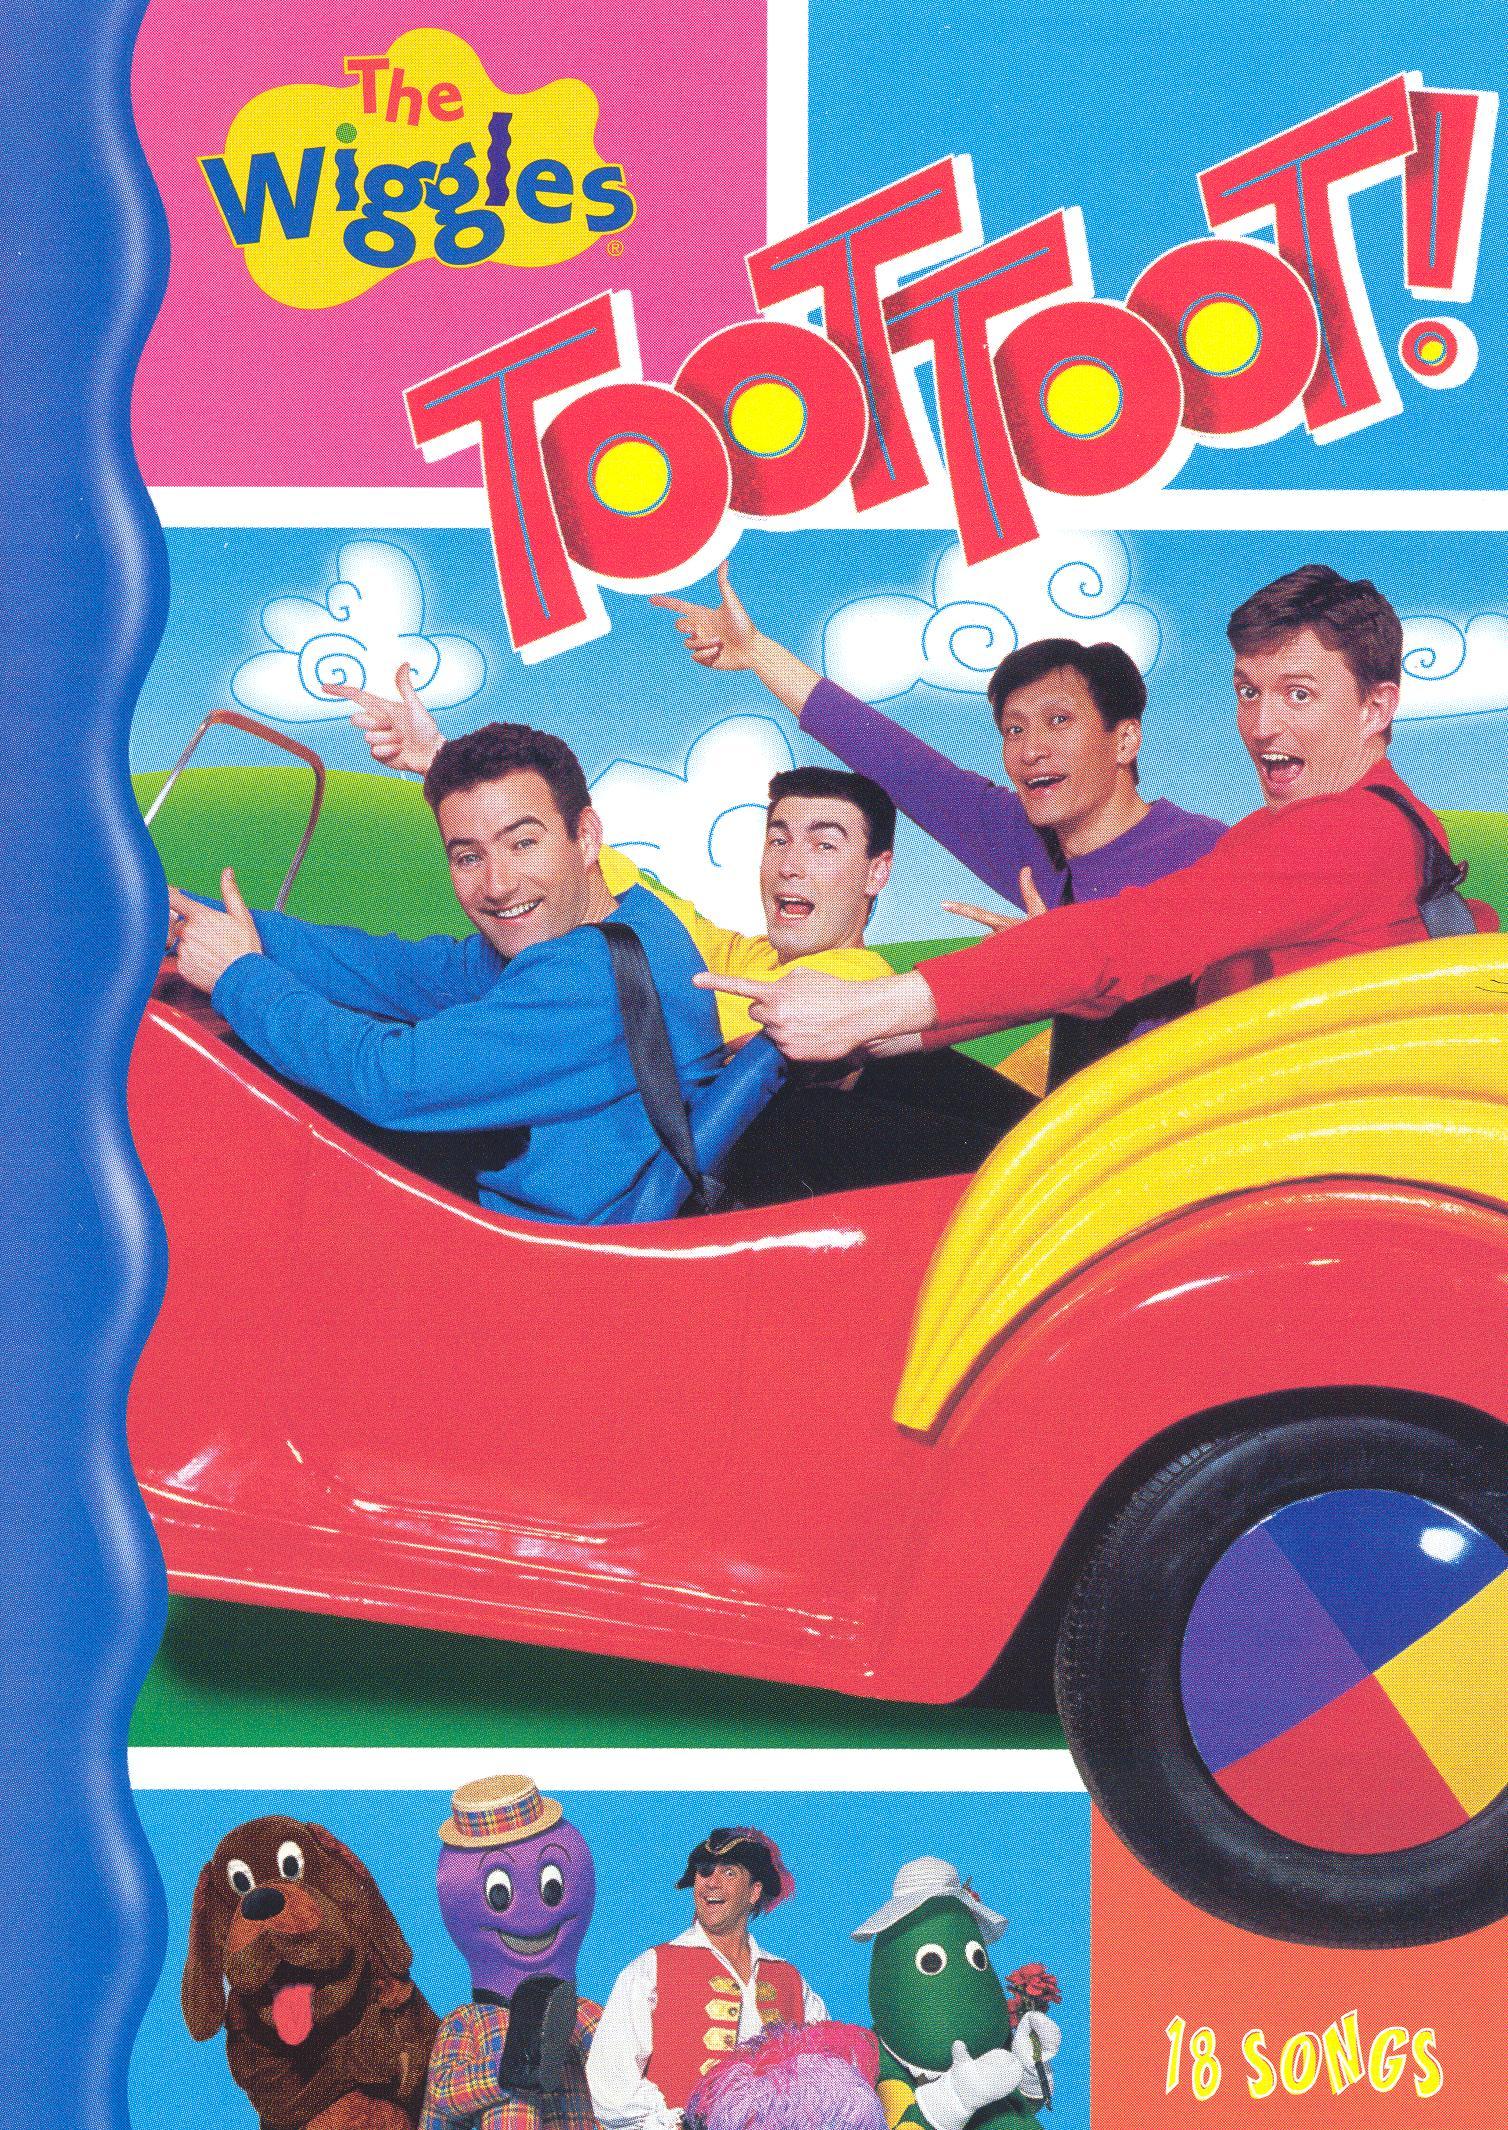 McTavish Chisholm - Toot Wiggles: Toot! (2001) The